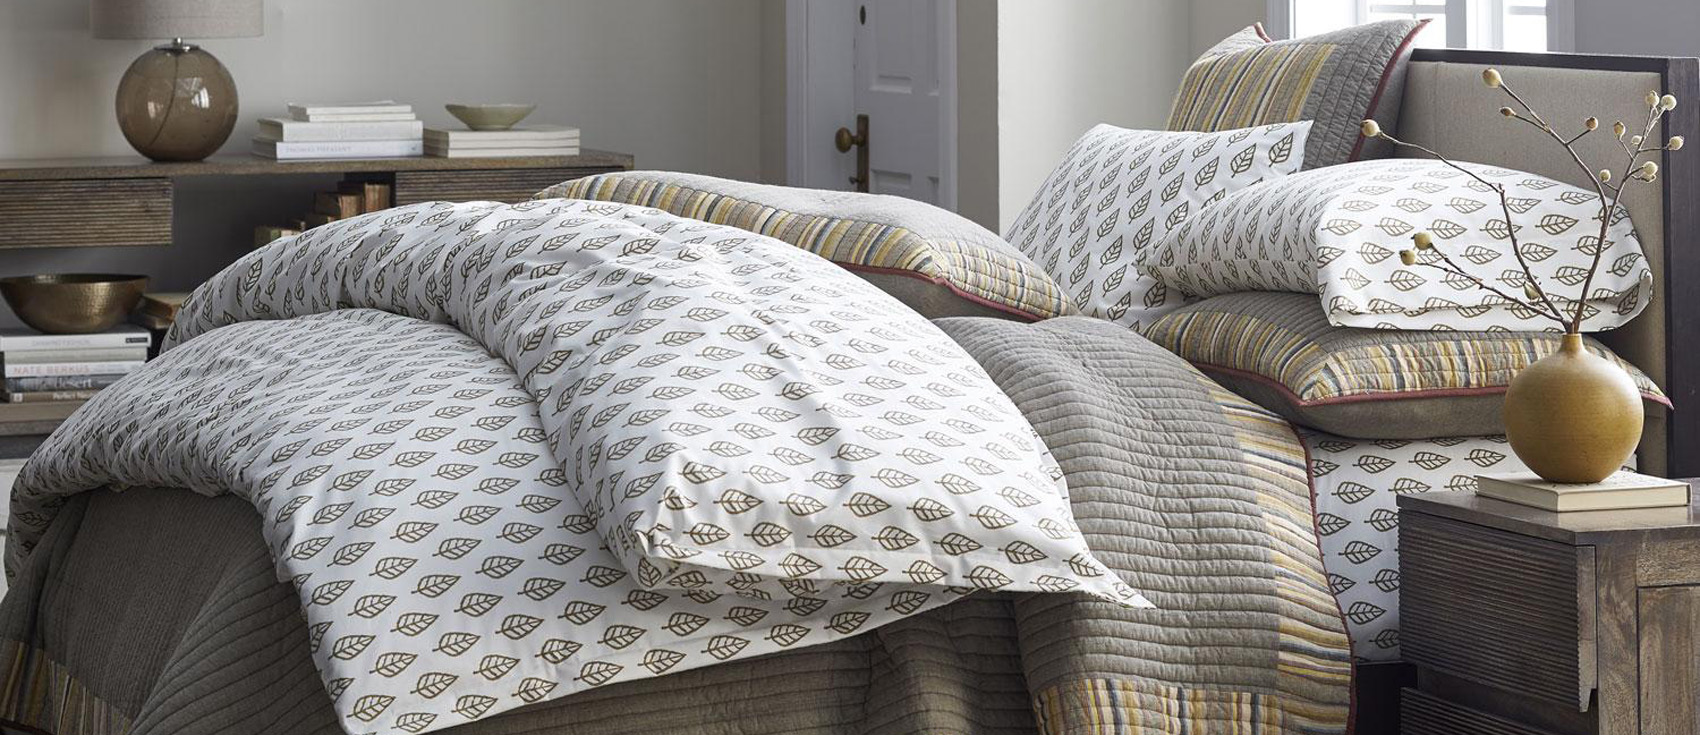 Duvet Covers & Quilt Bedding